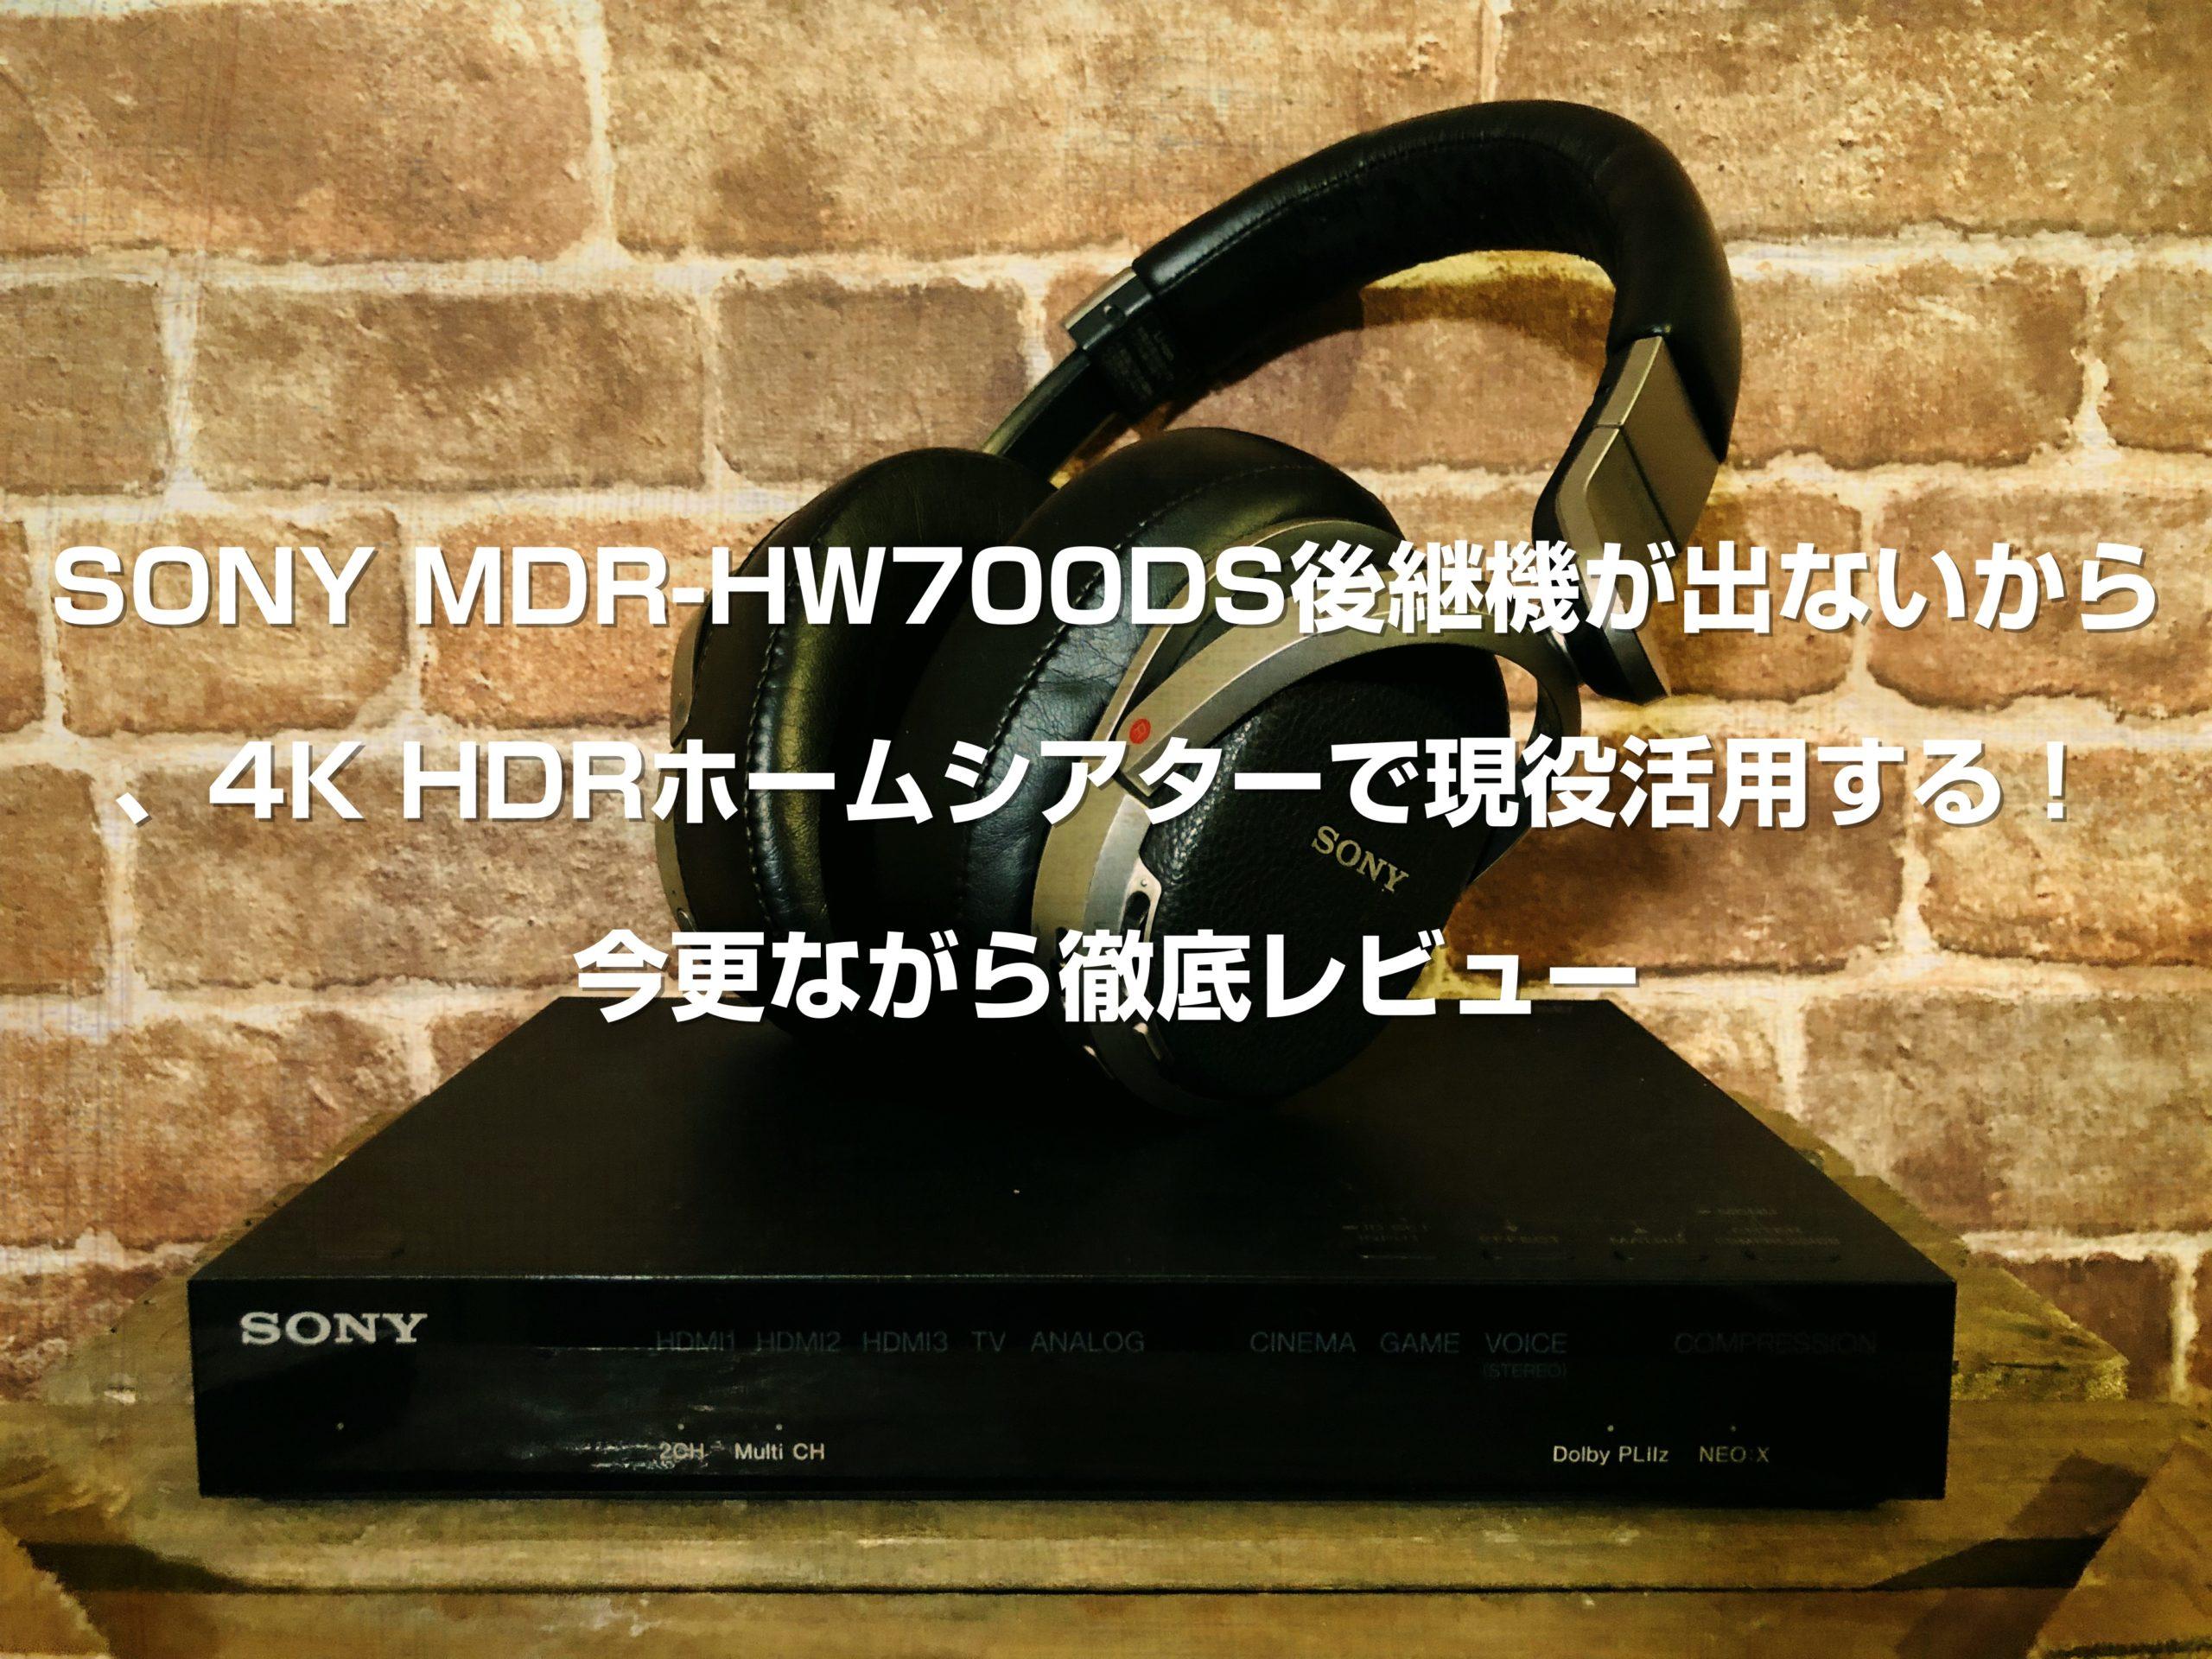 SONY MDR-HW700DS後継機が出ないから、4K HDRホームシアターで現役活用する!今更ながら徹底レビュー